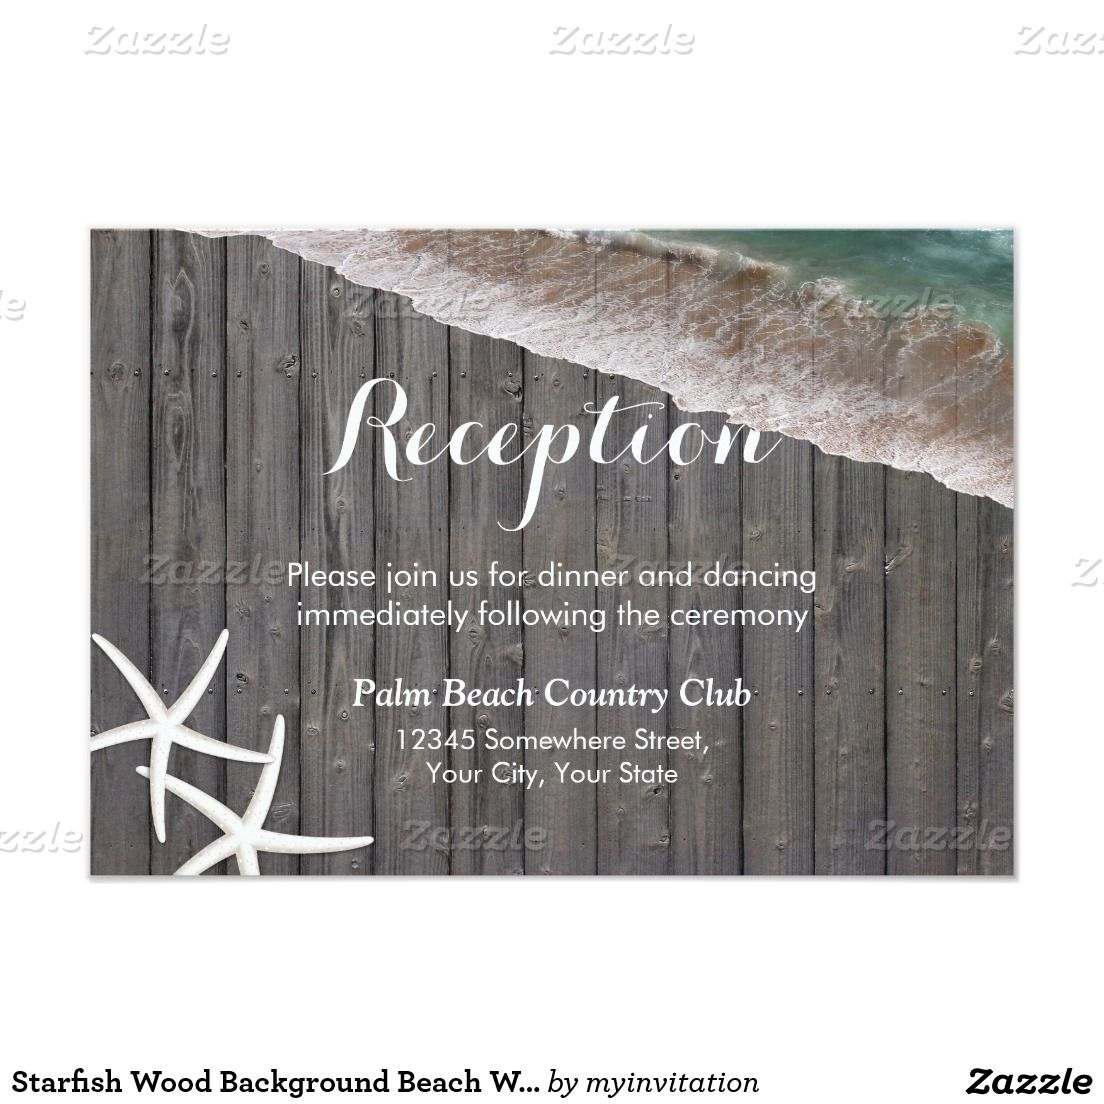 Starfish Wood Background Beach Wedding Reception Card | Wood ...